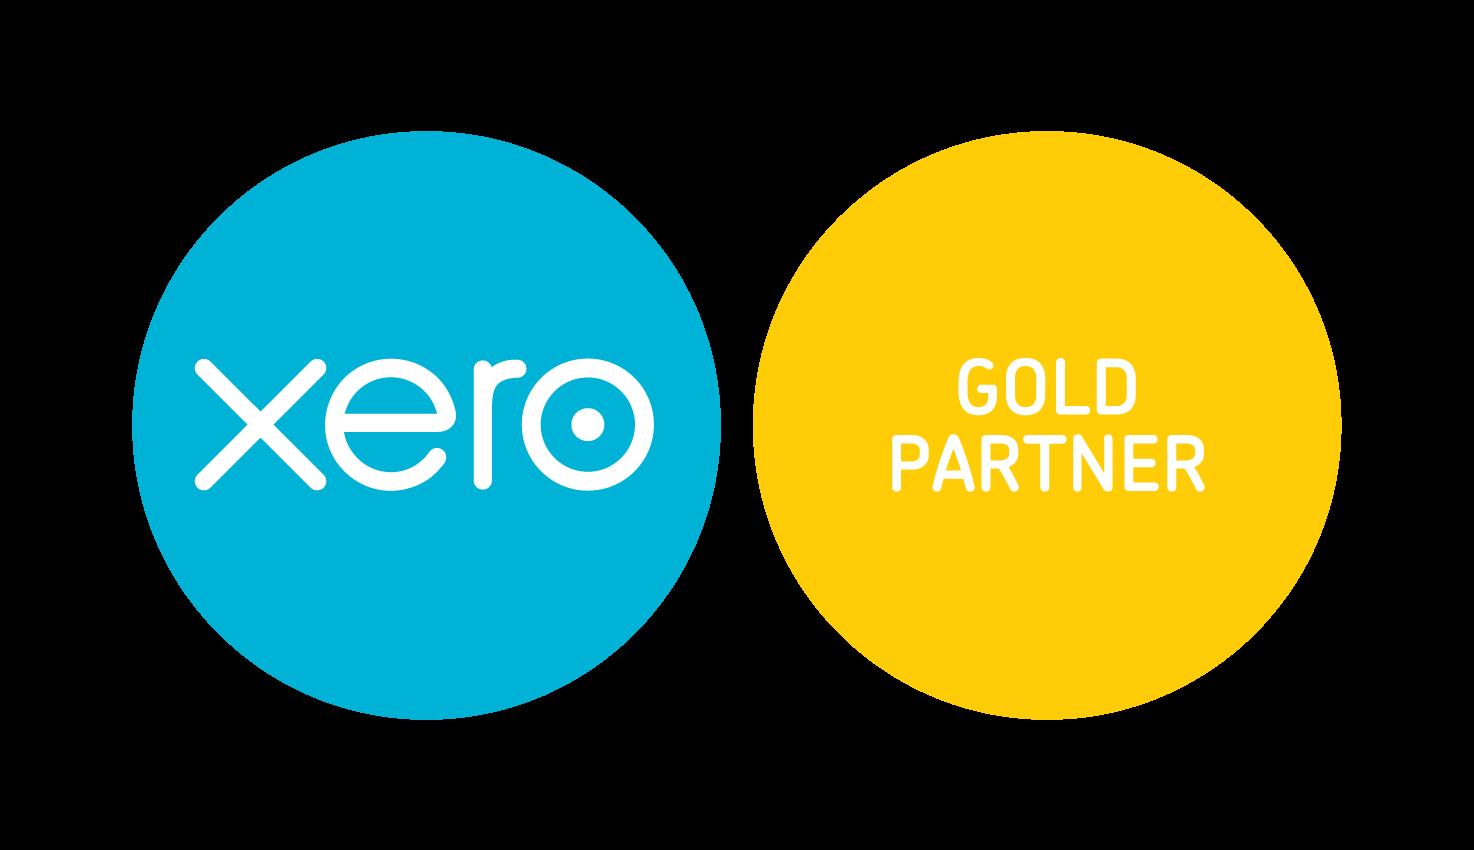 Xero Partner Gold Logo